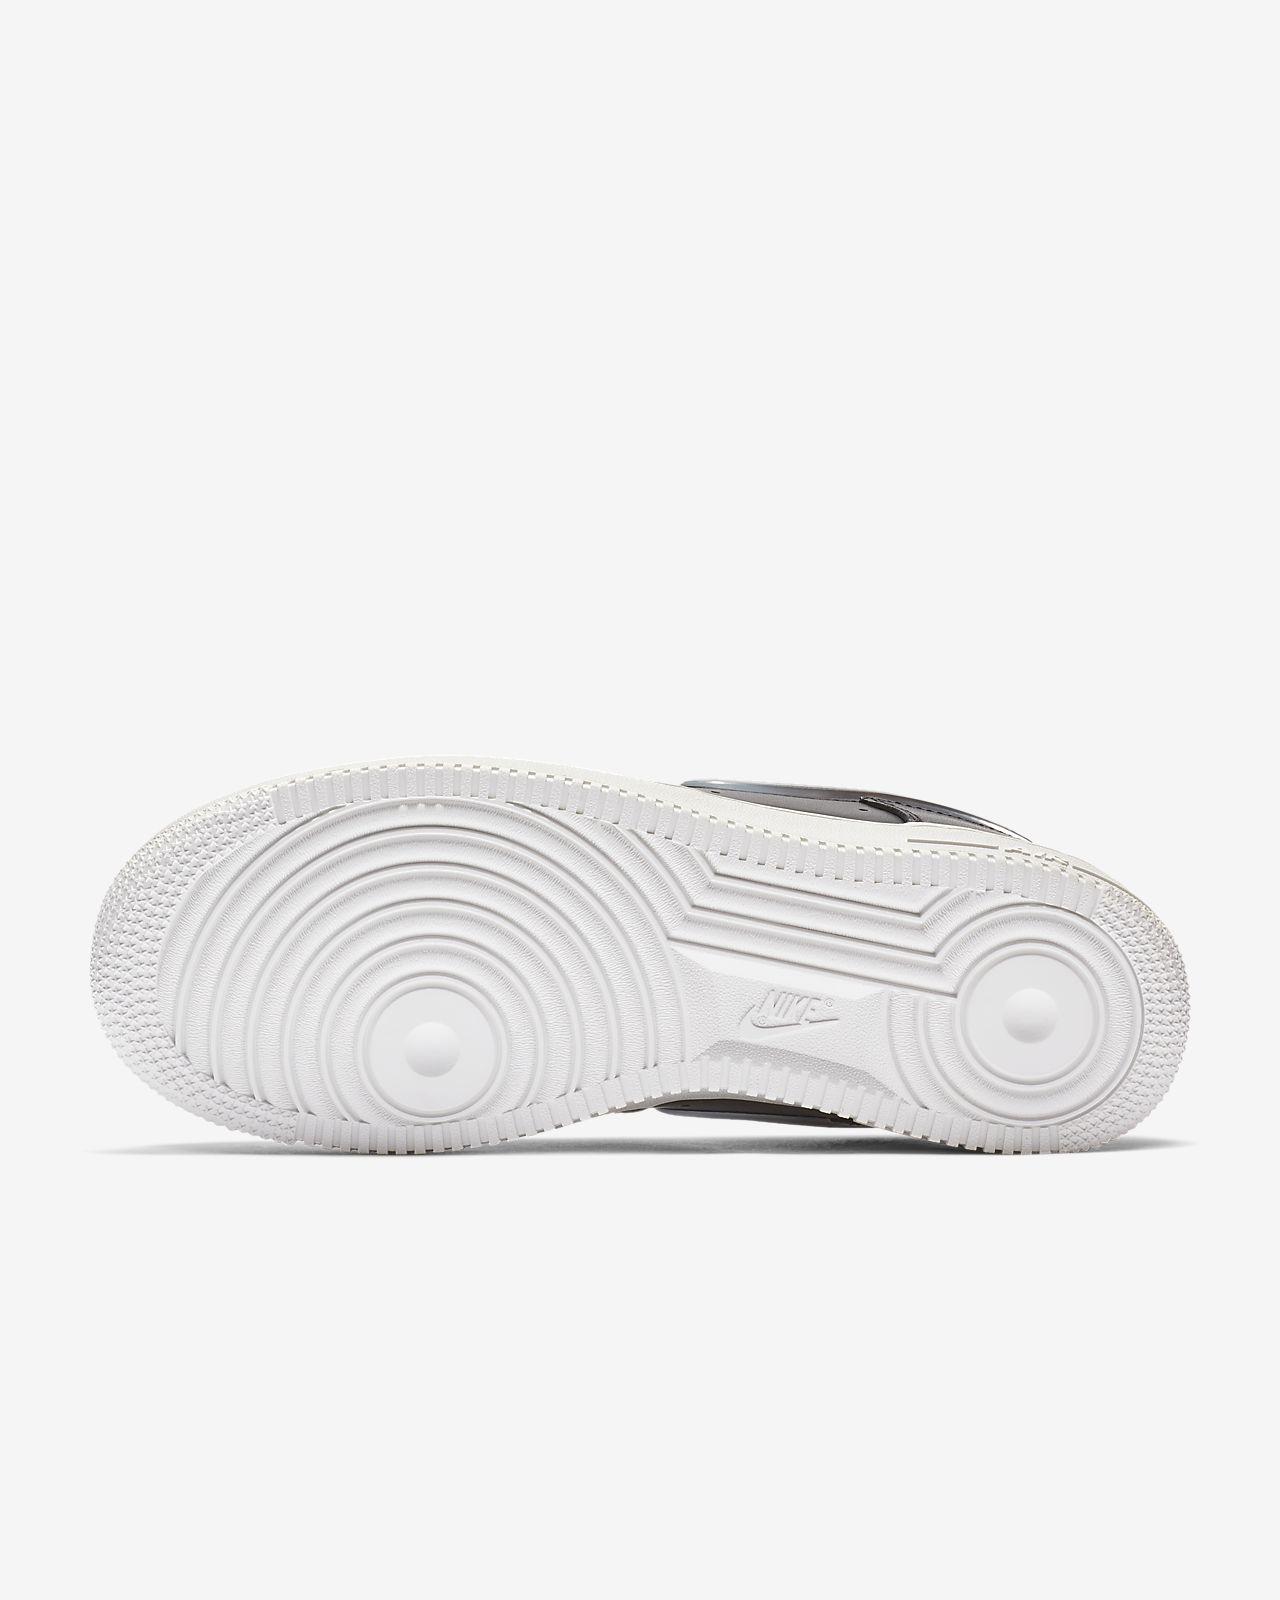 6f3bd020d52 Nike Air Force 1  07 SE Premium Women s Shoe. Nike.com ZA